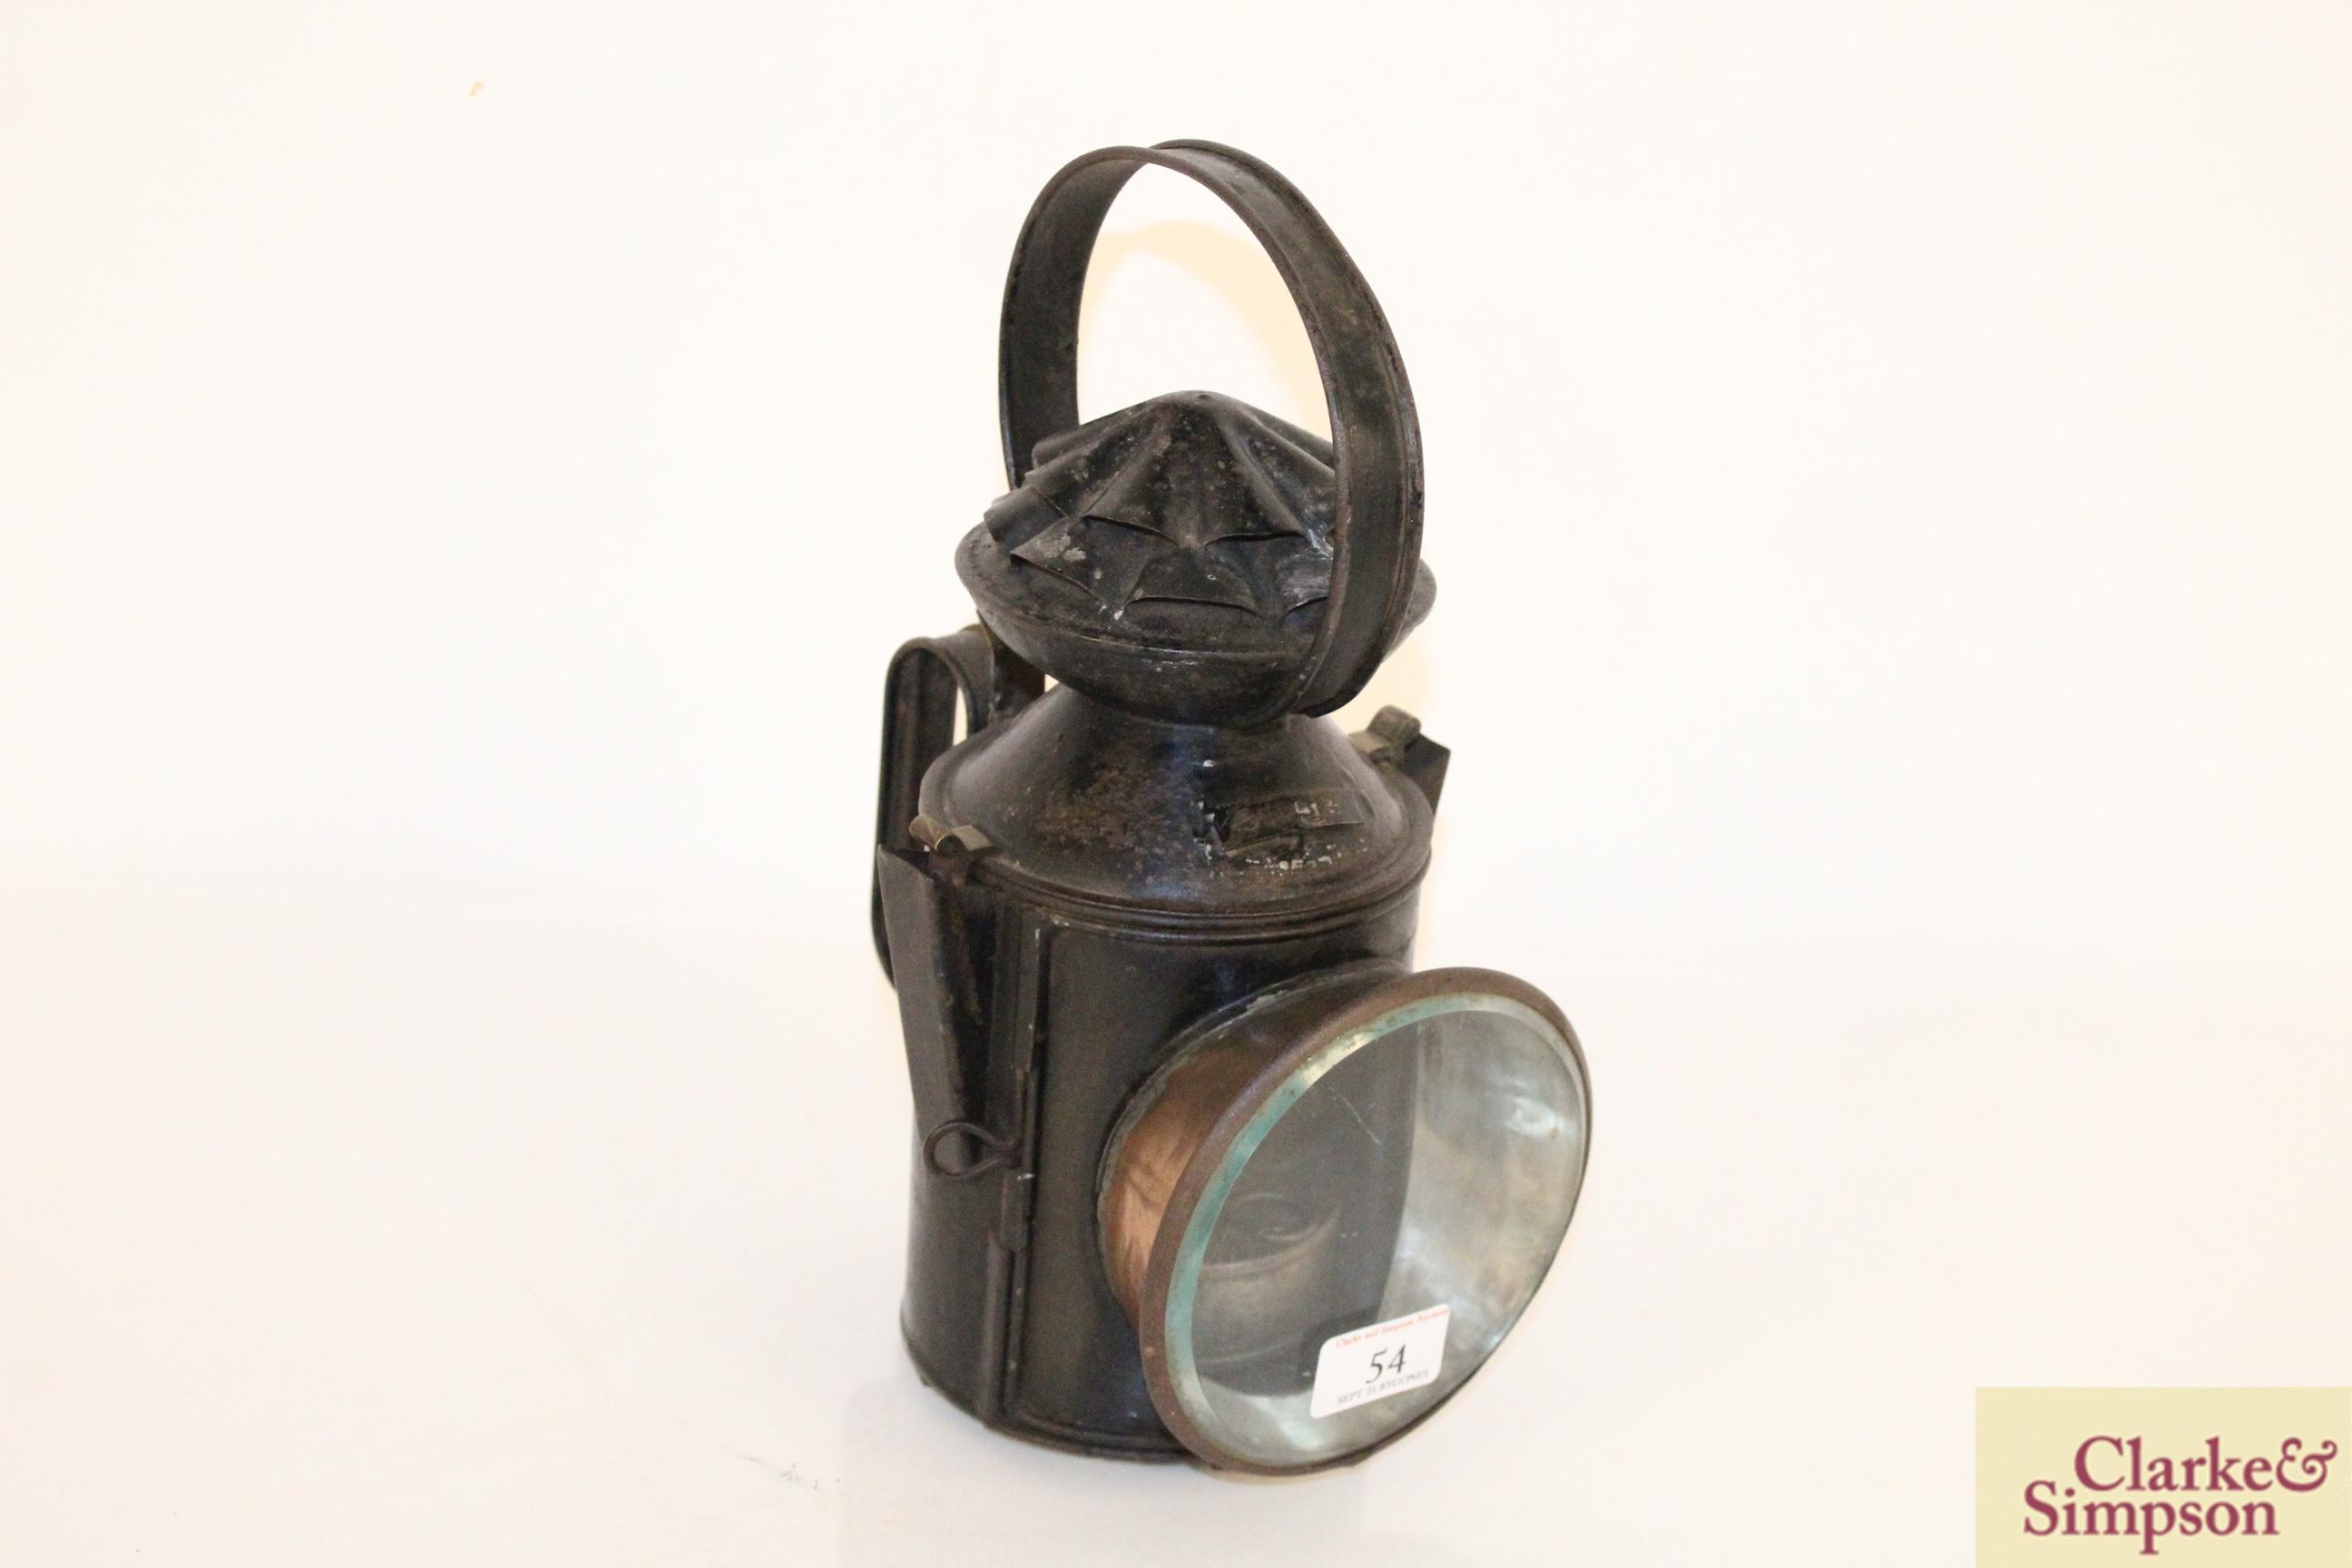 A railway lamp